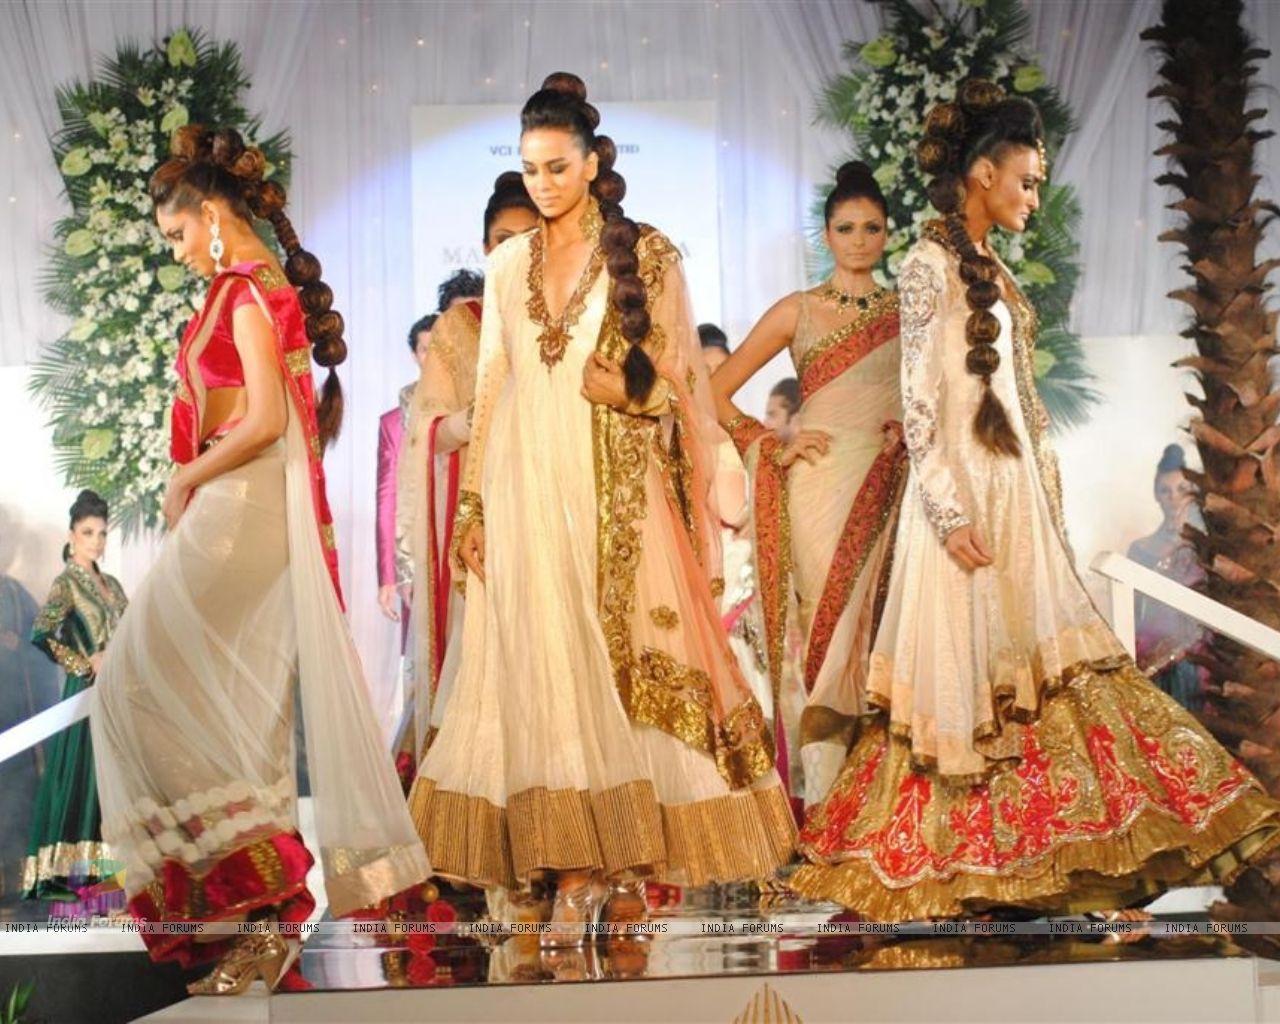 Wallpaper   Model Walks for fashion designer Manish Malhotra at Aamby 1280x1024